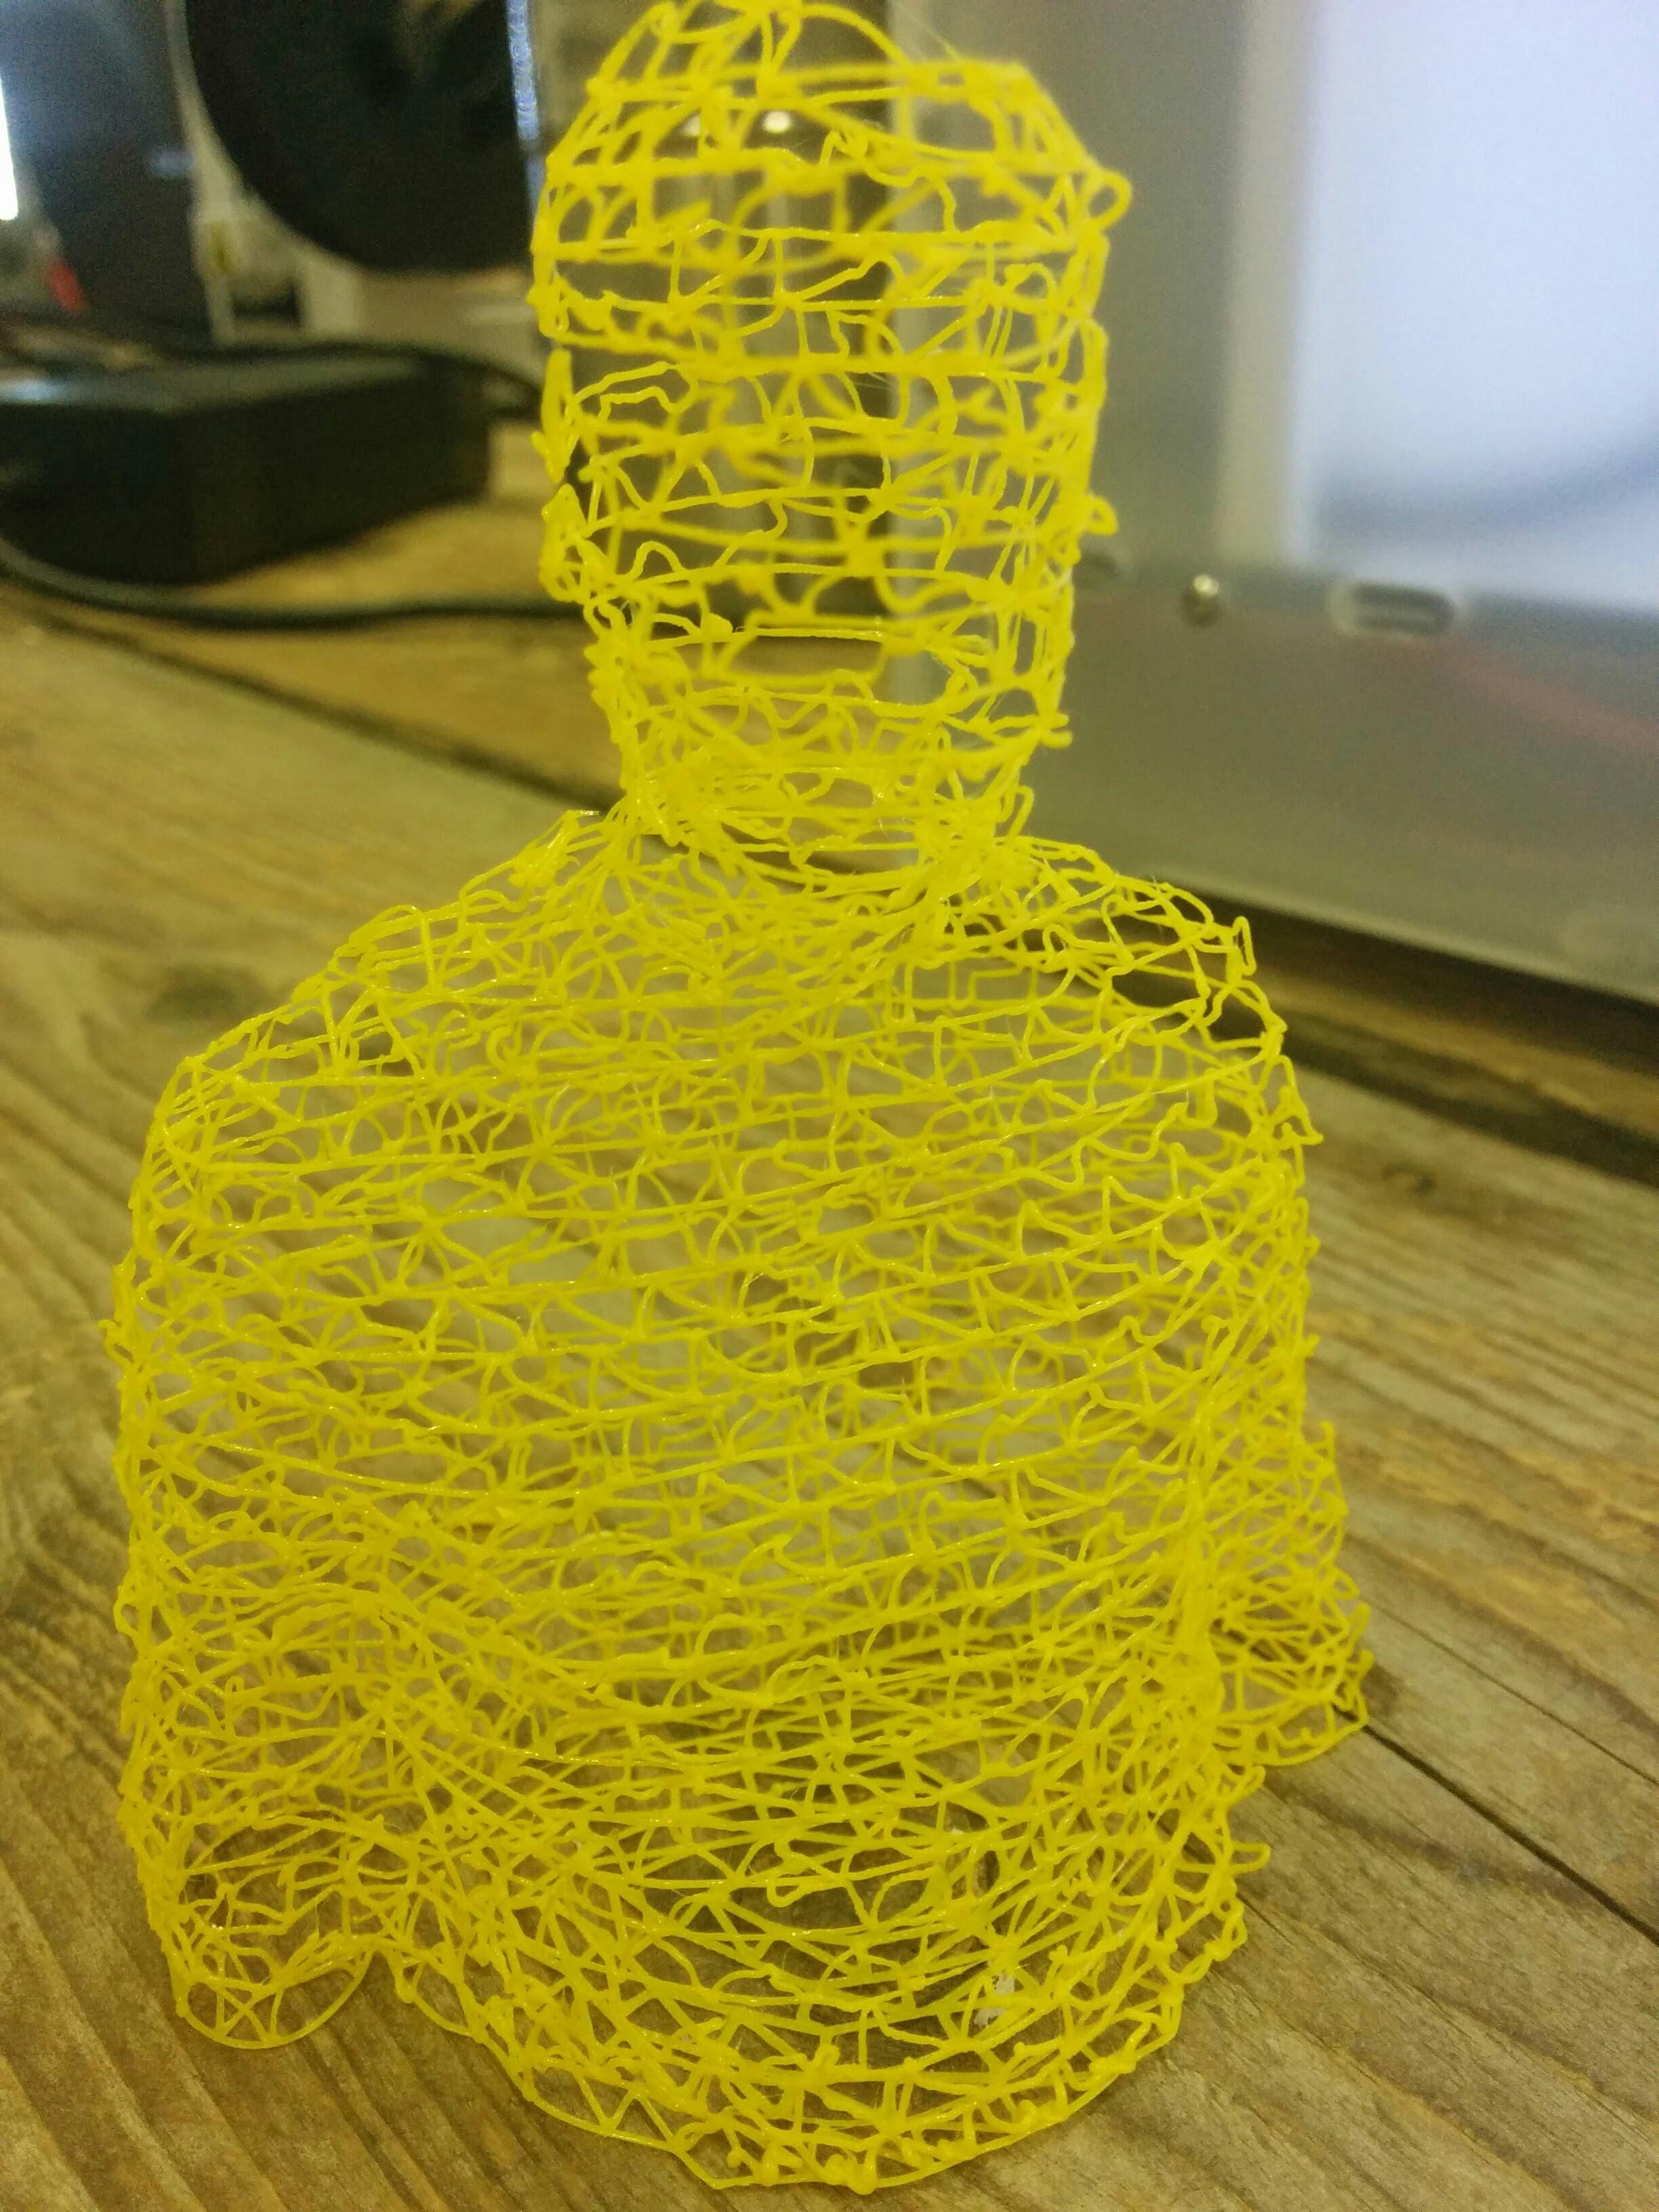 Wire Printing - Cura 15 06 03 - 3D Printing / 3D Printers - Talk